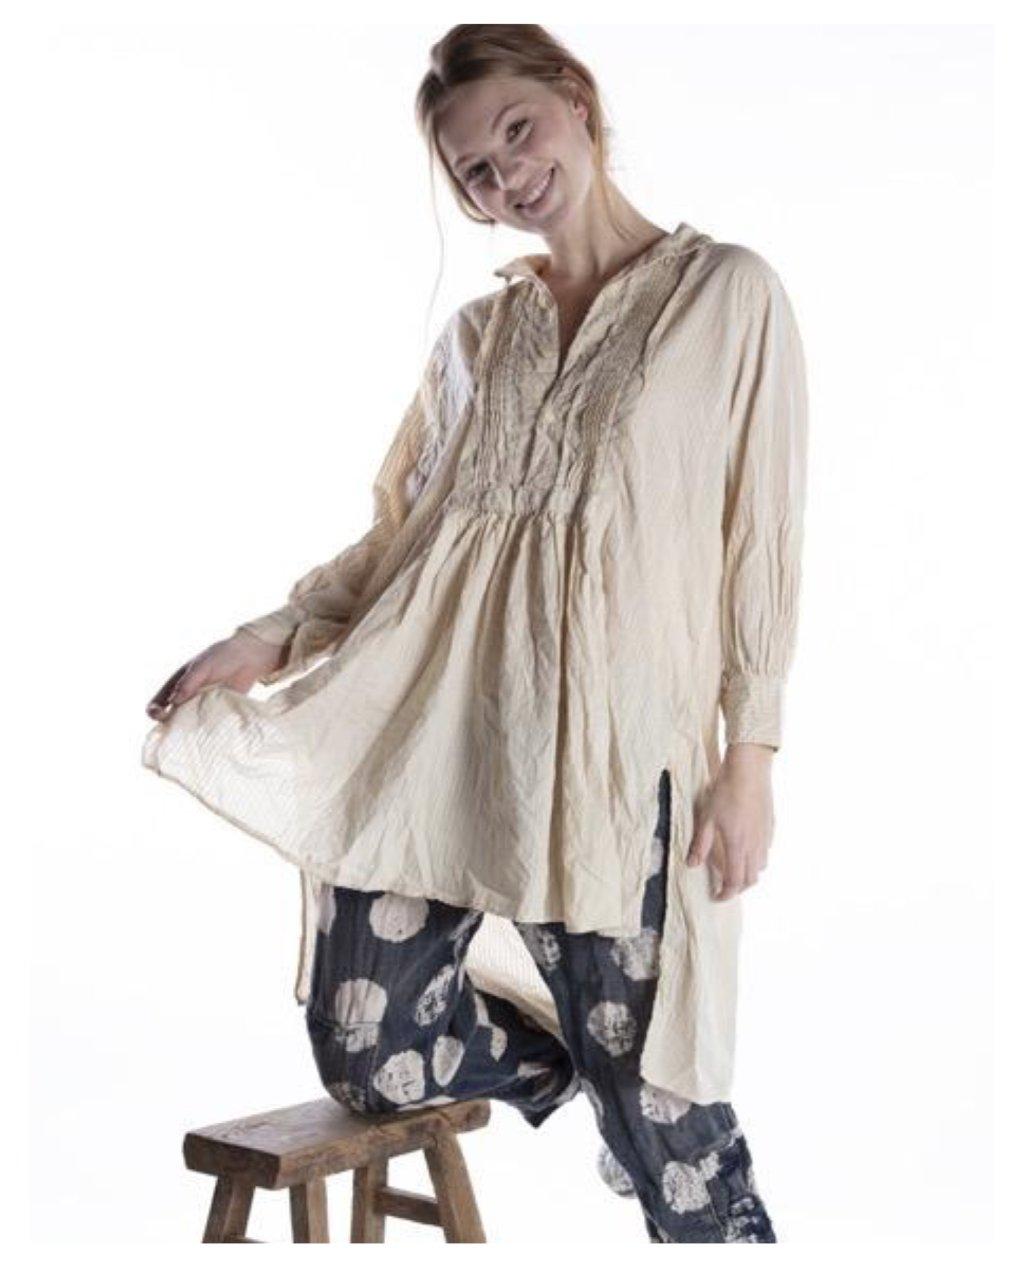 Magnolia Pearl | Cordelia Night Shirt| Striped Cotton | Moonlight